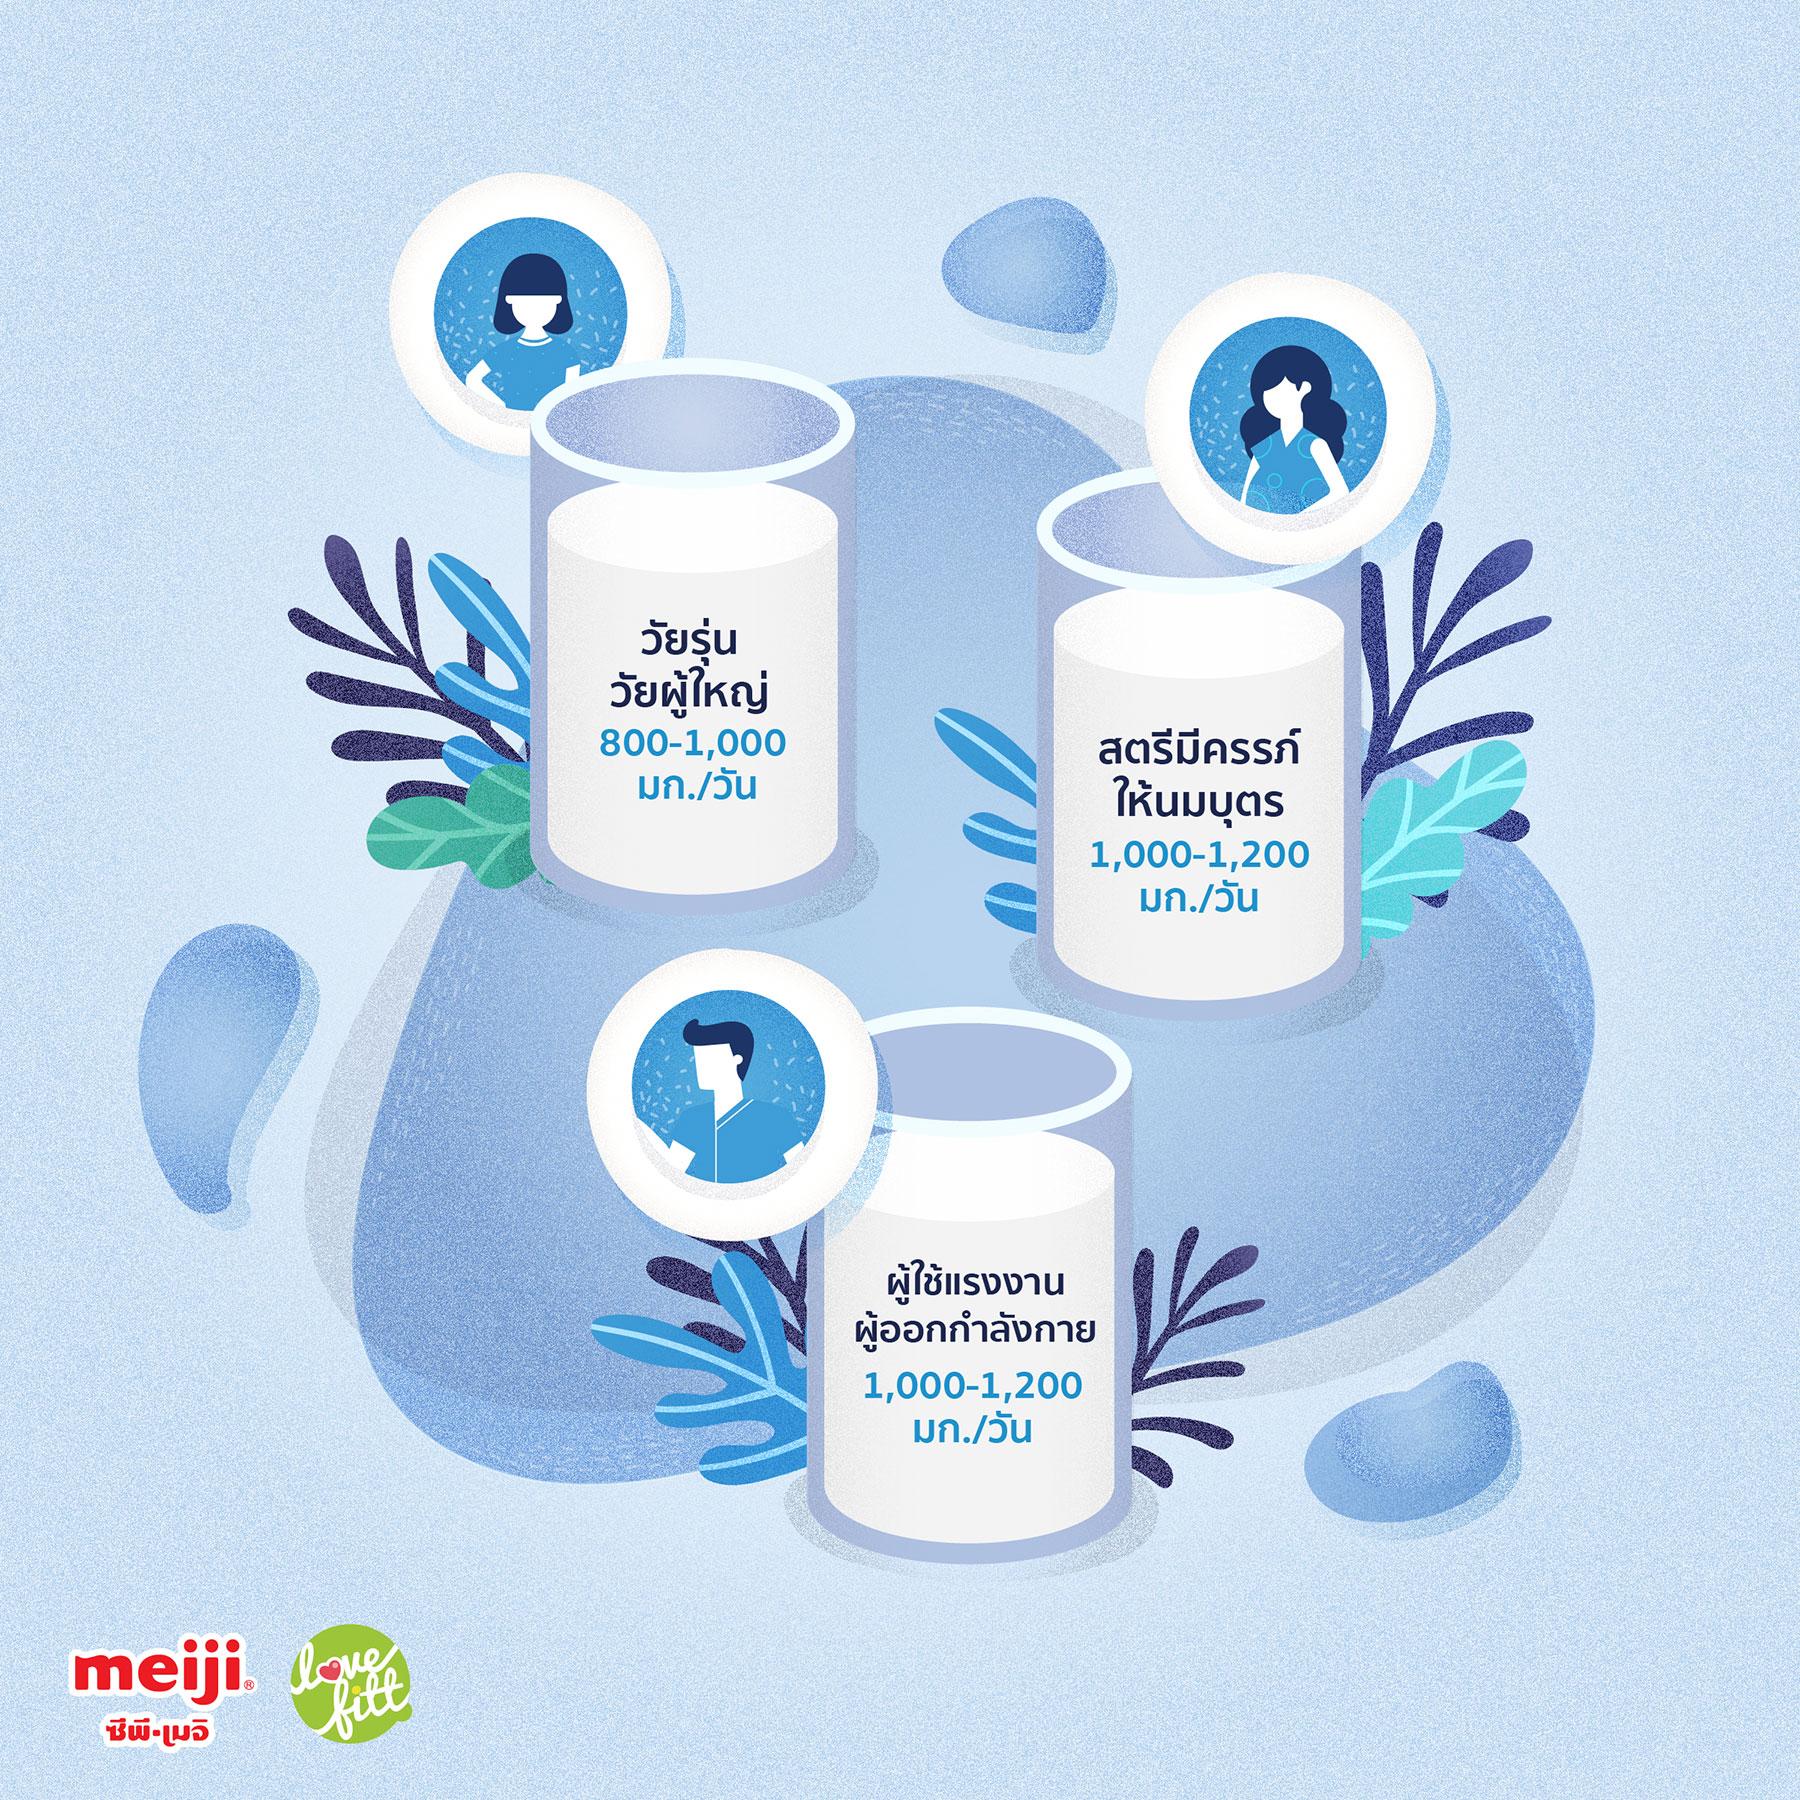 meiji-lactose-free-milk-img-02